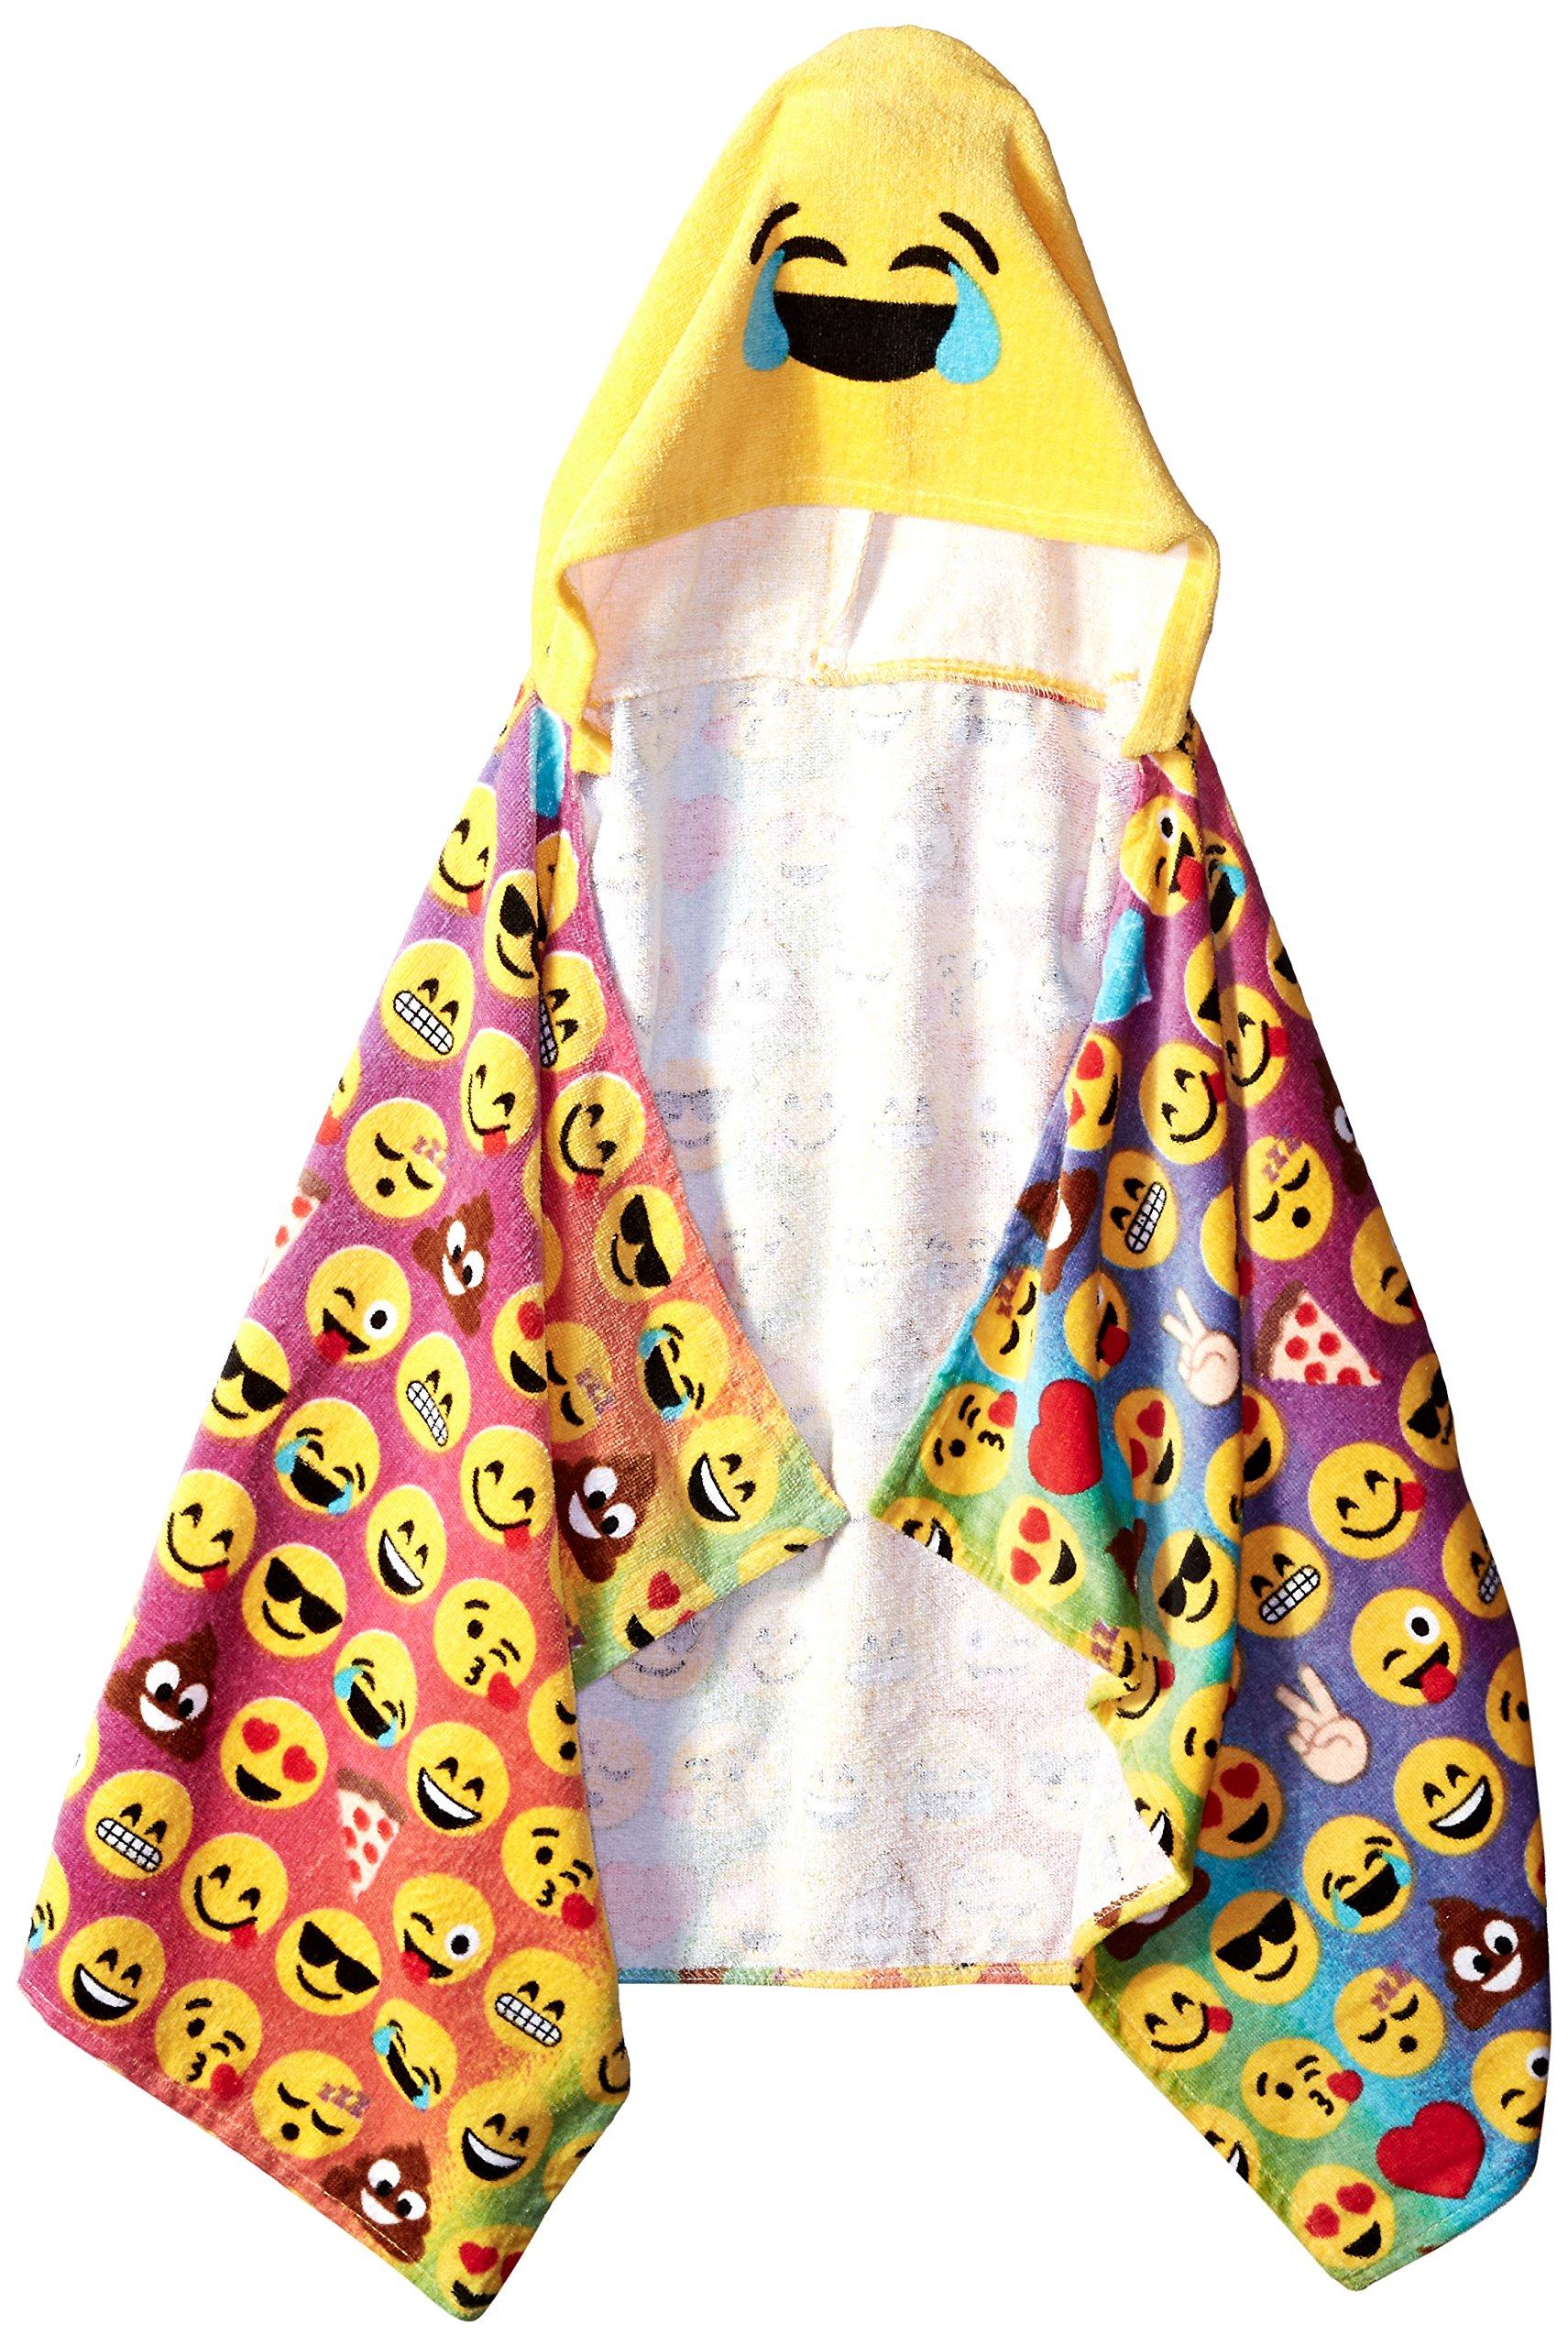 Emoji Pals  Rainbow Hooded Towel, Multicolor by Emoji Pals (Image #1)